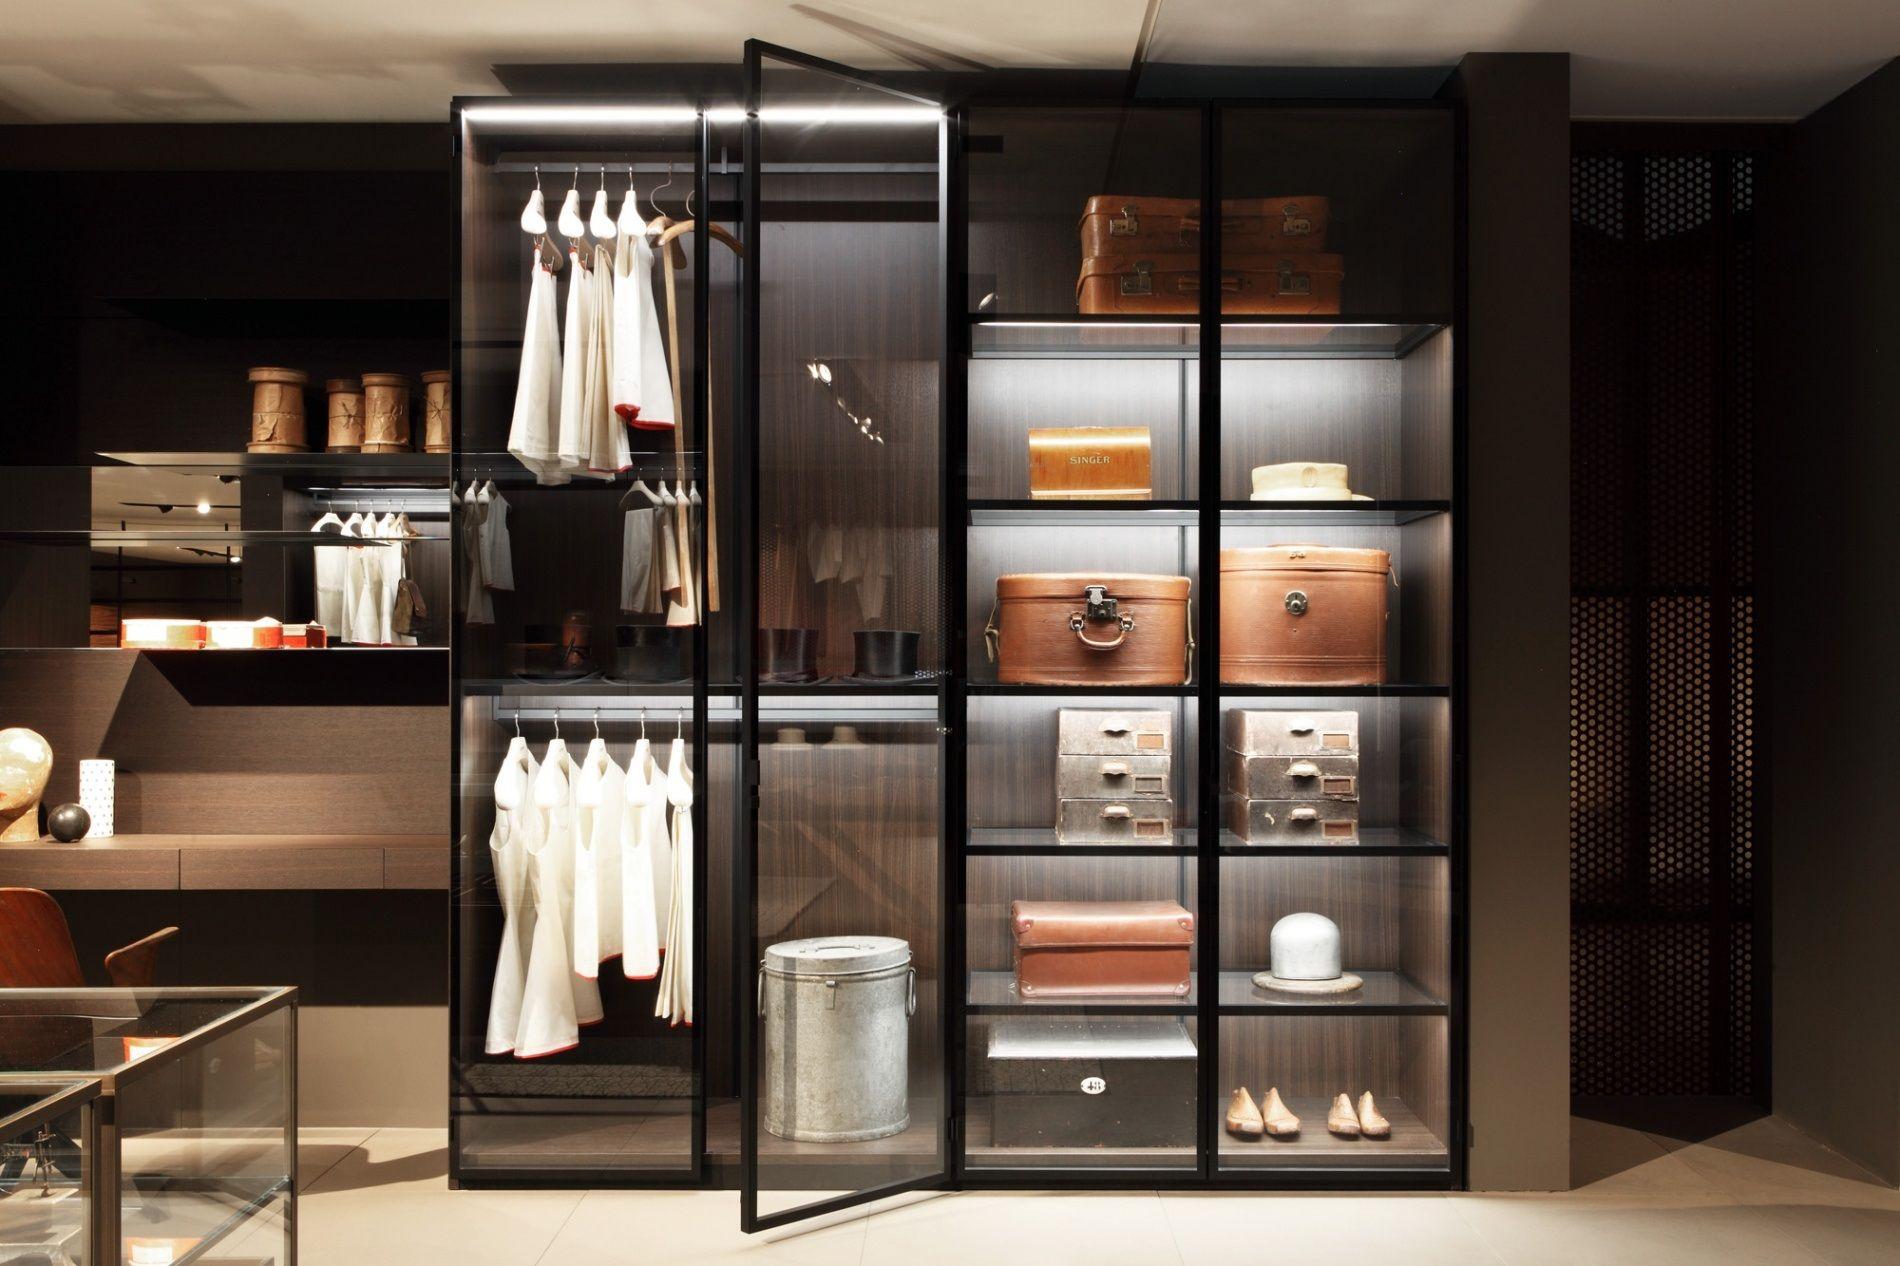 garde robe et salle de rangement garderobe rangement relooking habitation vivahabitation inspirationdeco idmaison tendance design architecte